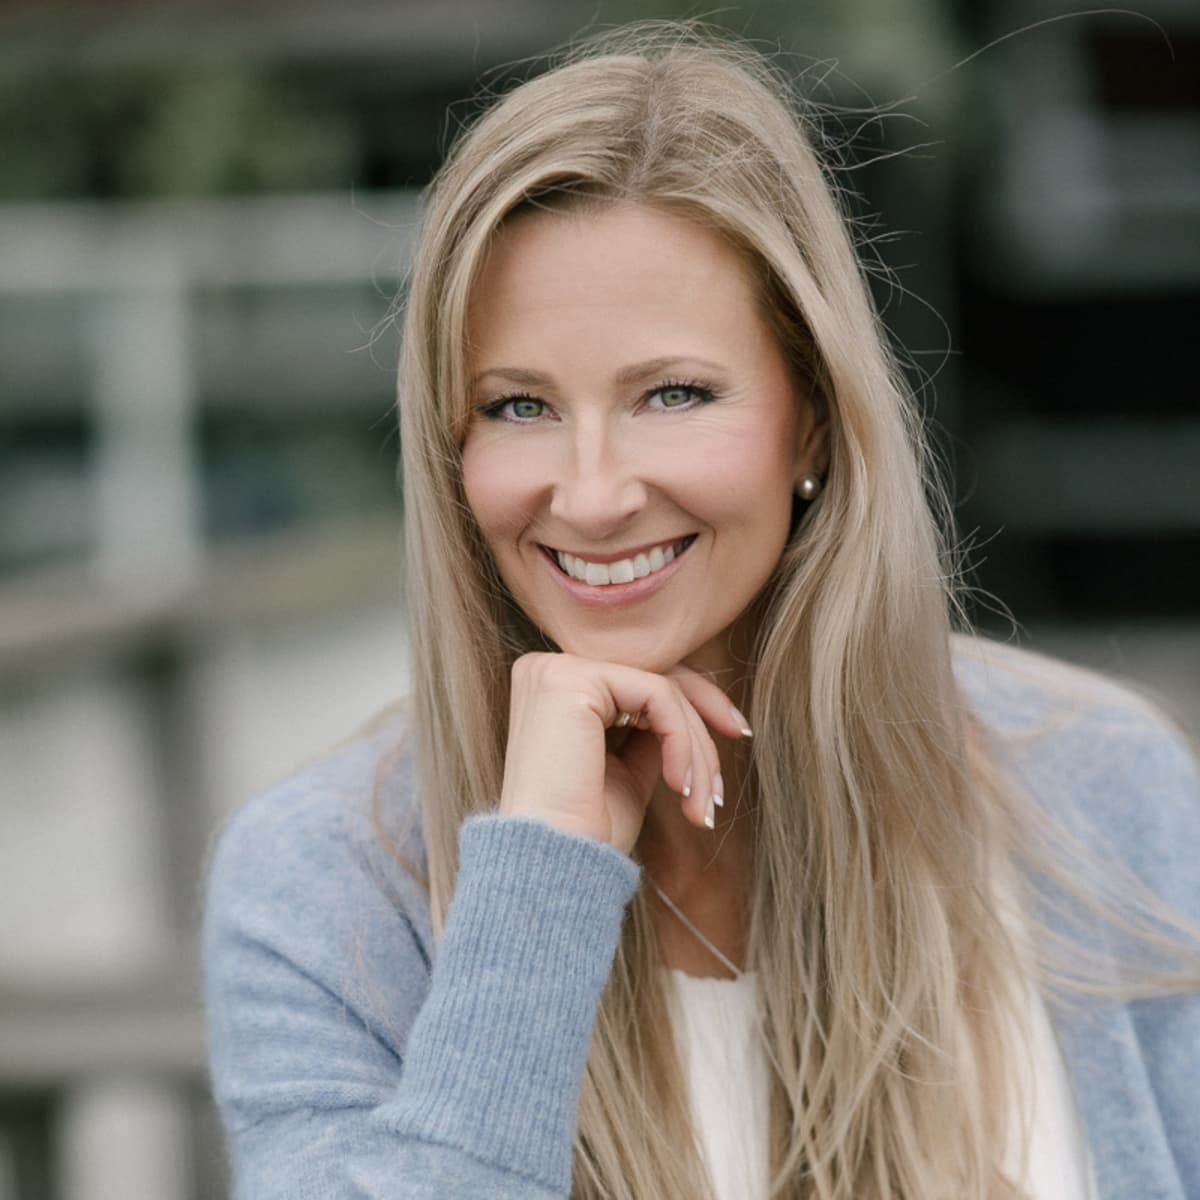 Lastenpsykologi Leea Mattila